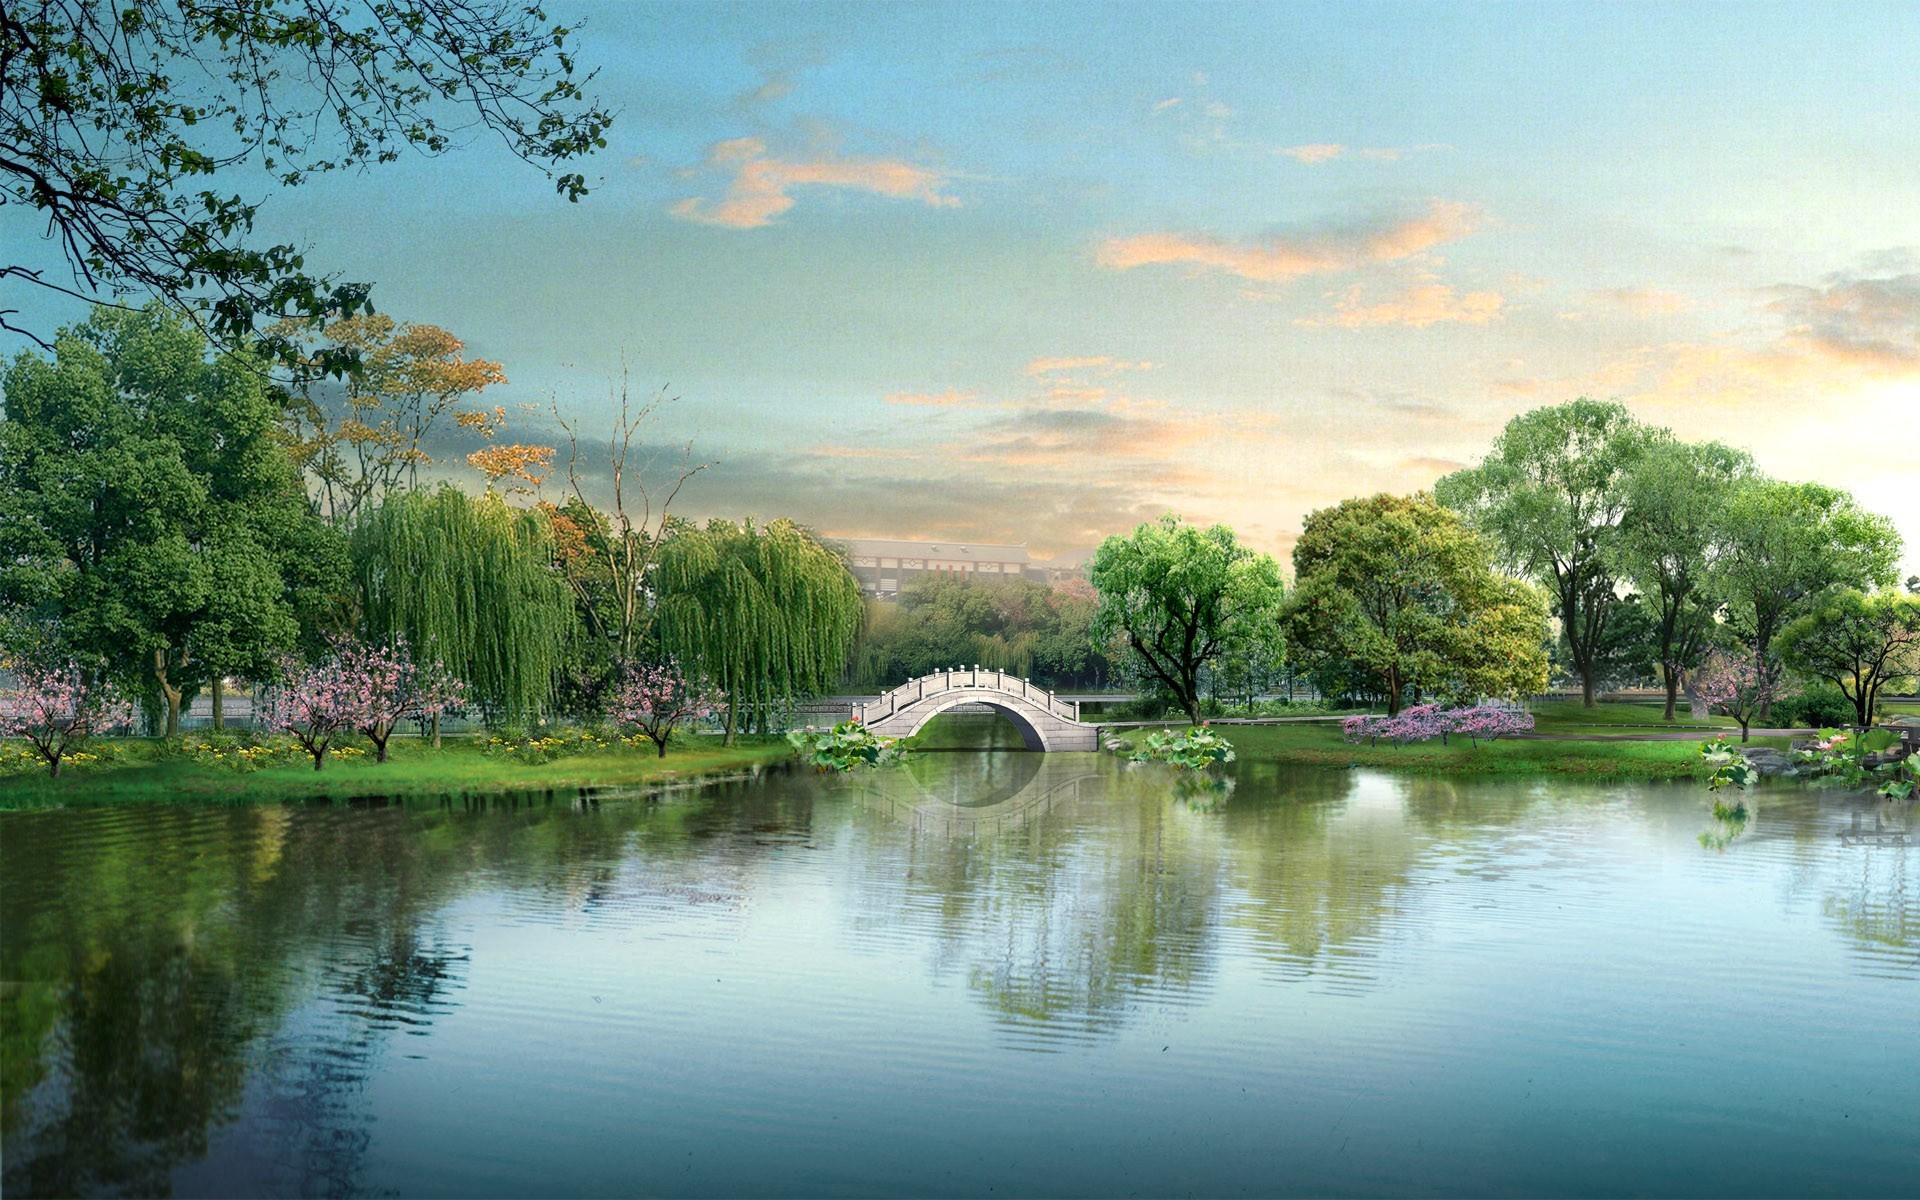 beautiful landscape photos   beautiful nature landscapes wallpapers hd  widescreen desktop wallpaper .